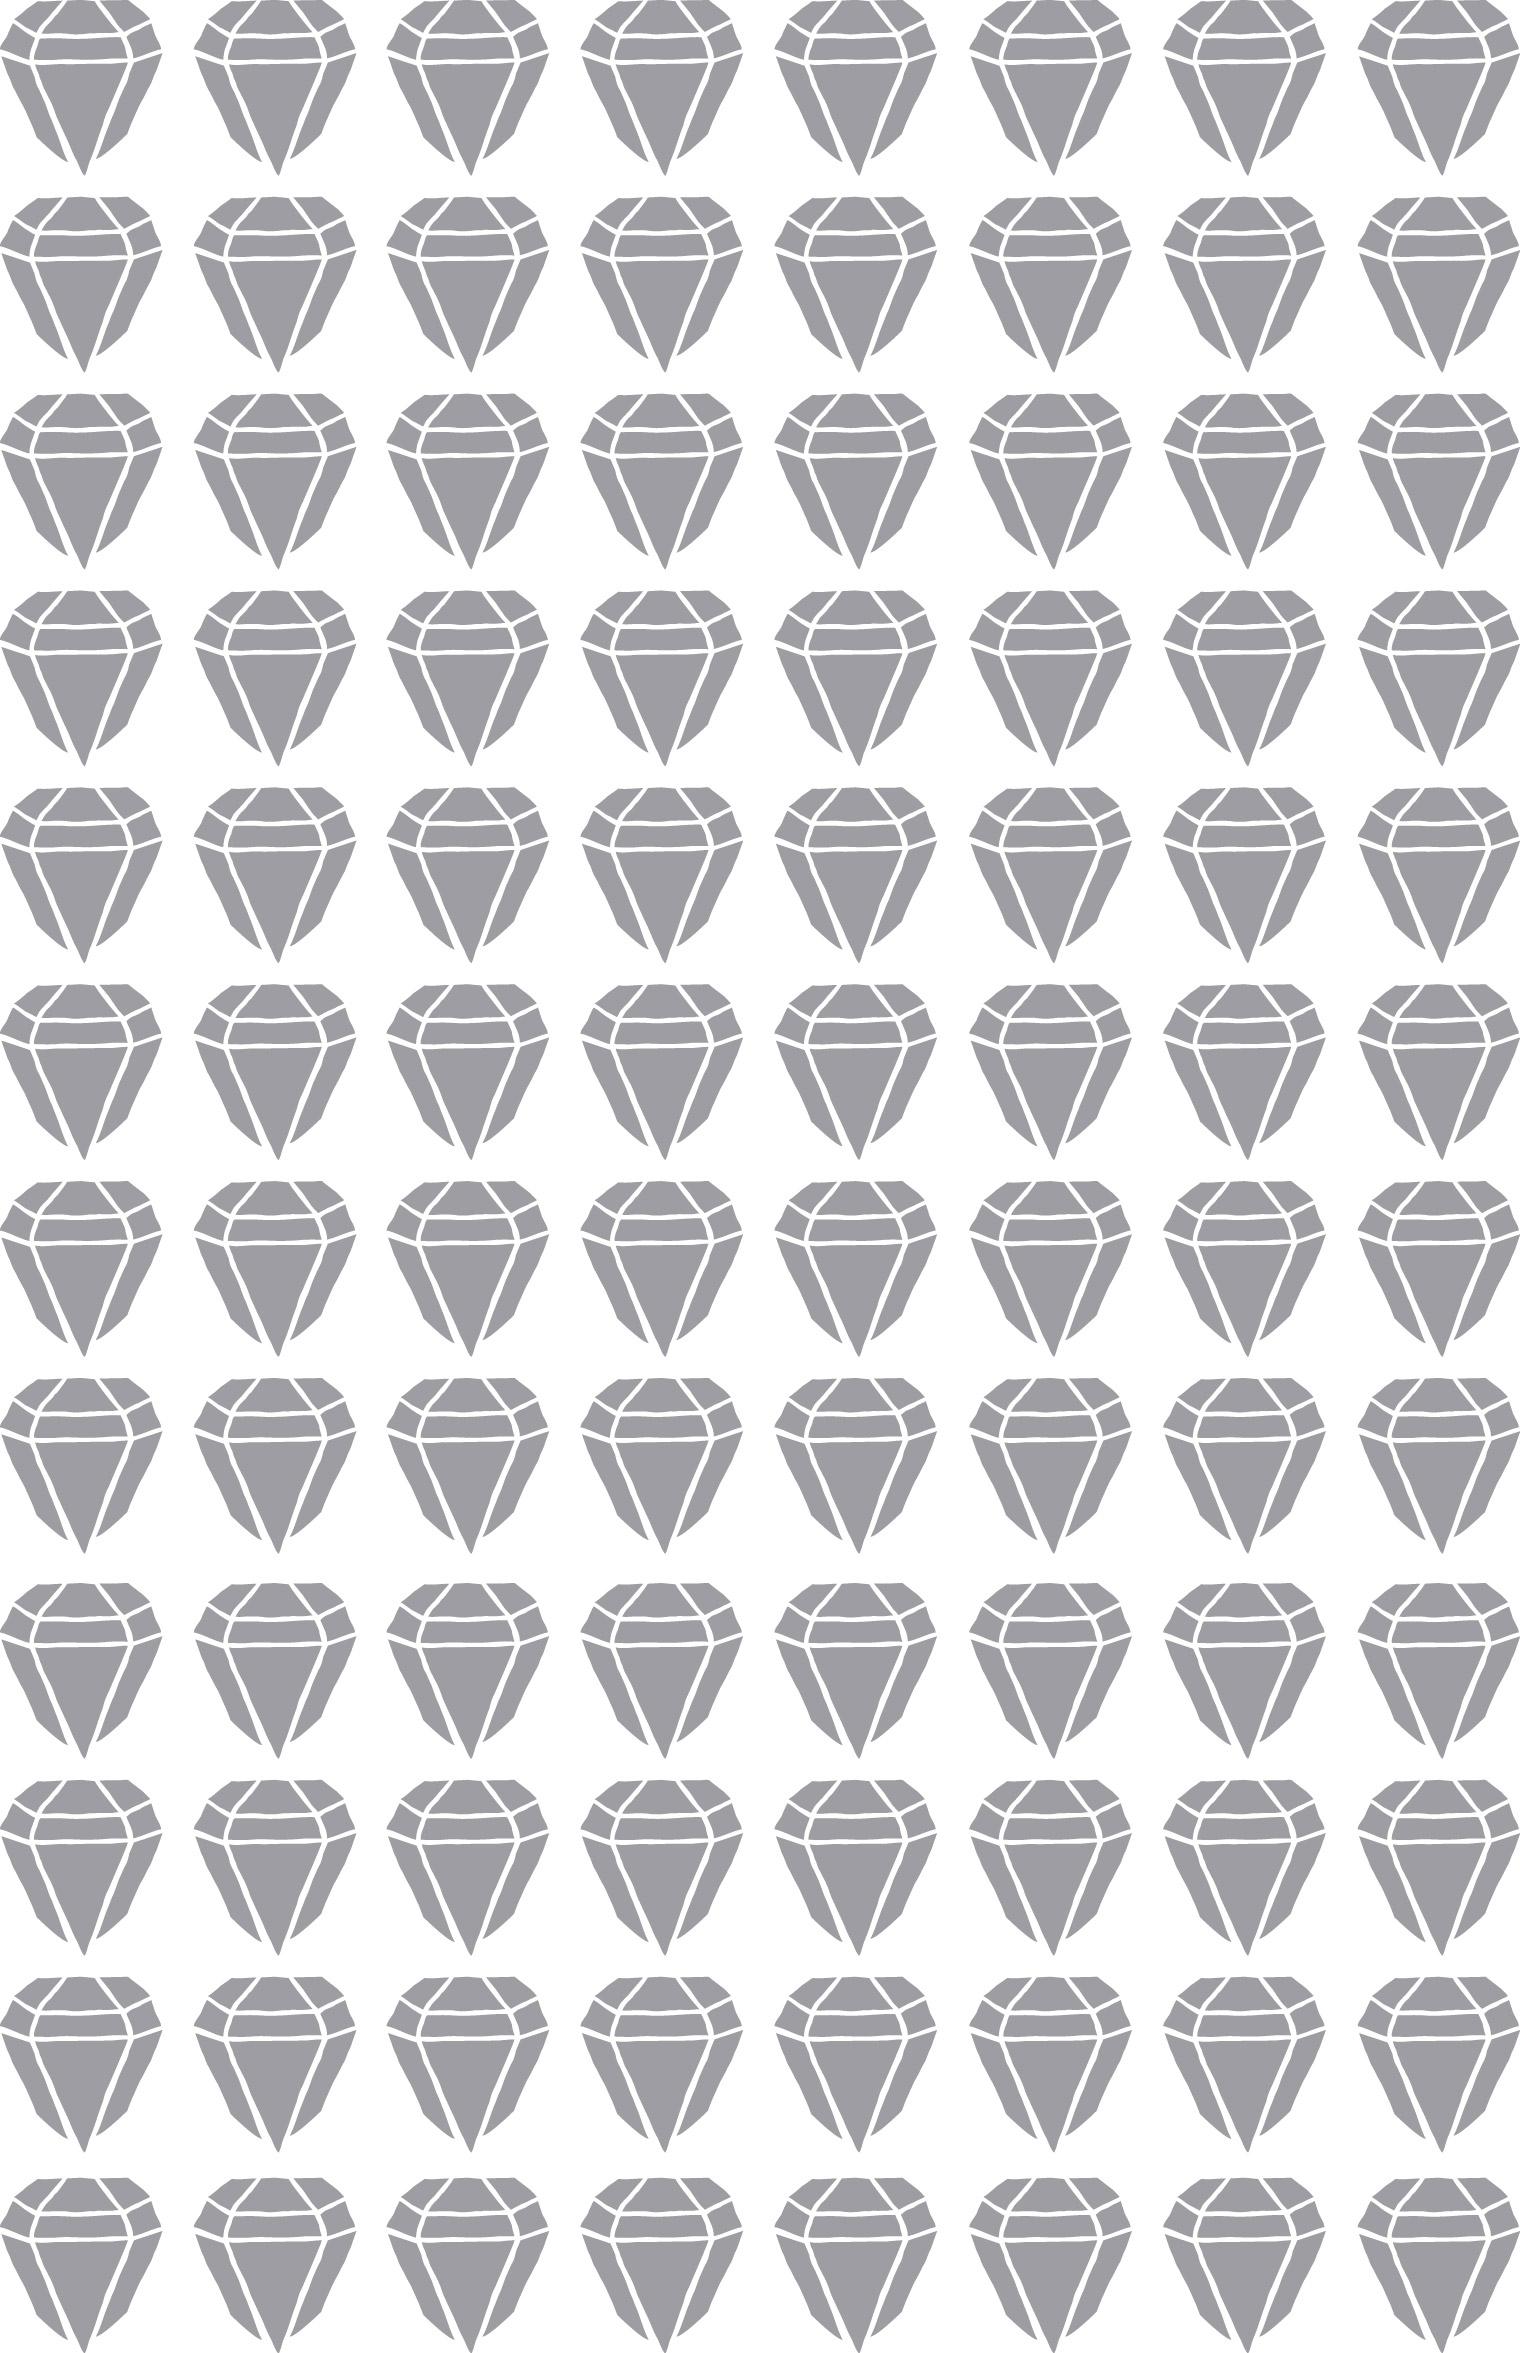 DMD_iPhone_Repeat Gem Grey on White.jpg